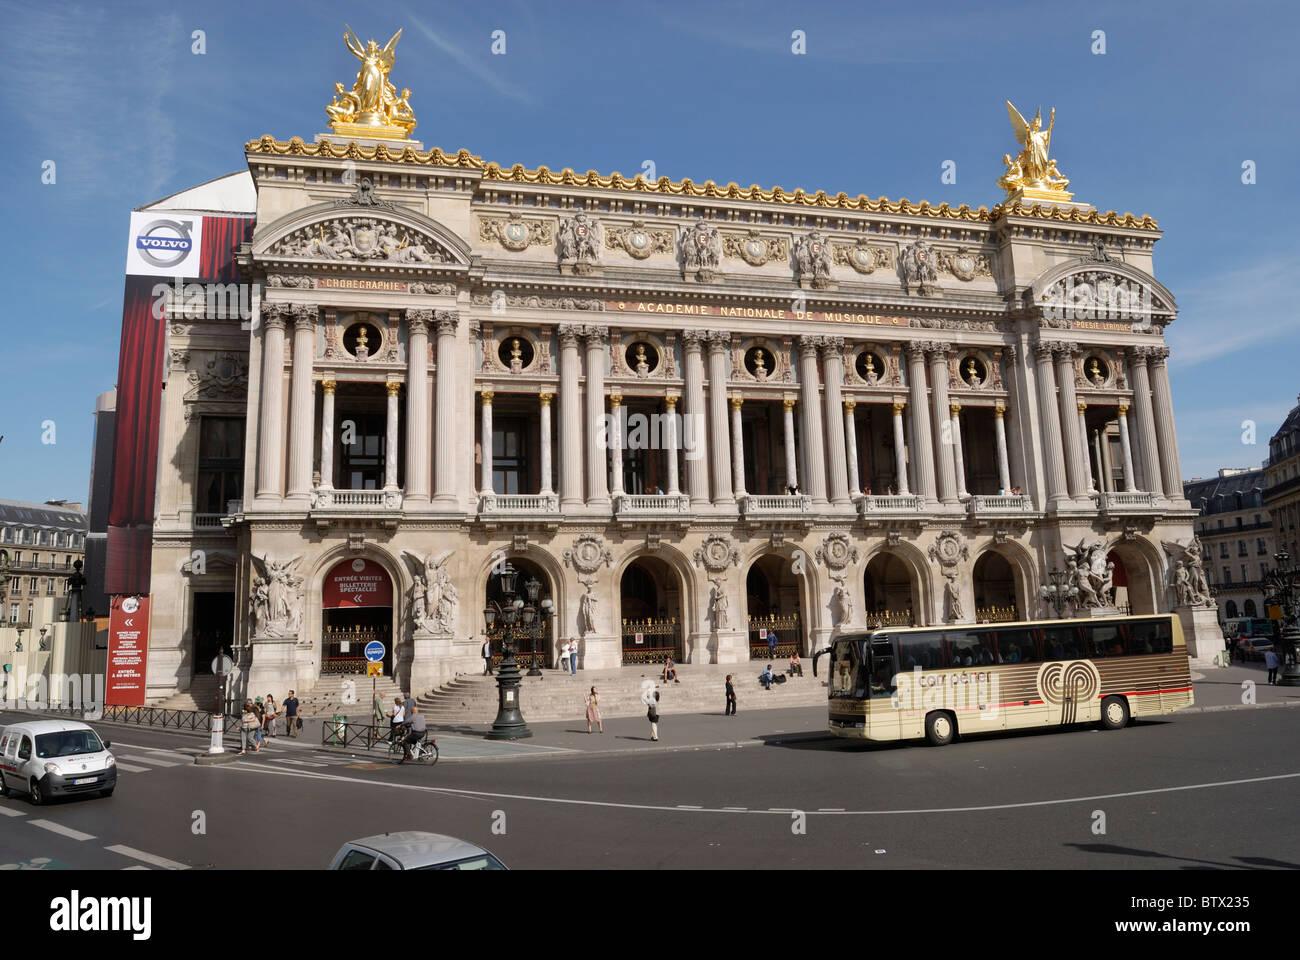 place de l 39 opera palais garnier located on avenue d 39 opera in paris stock photo 32534521 alamy. Black Bedroom Furniture Sets. Home Design Ideas